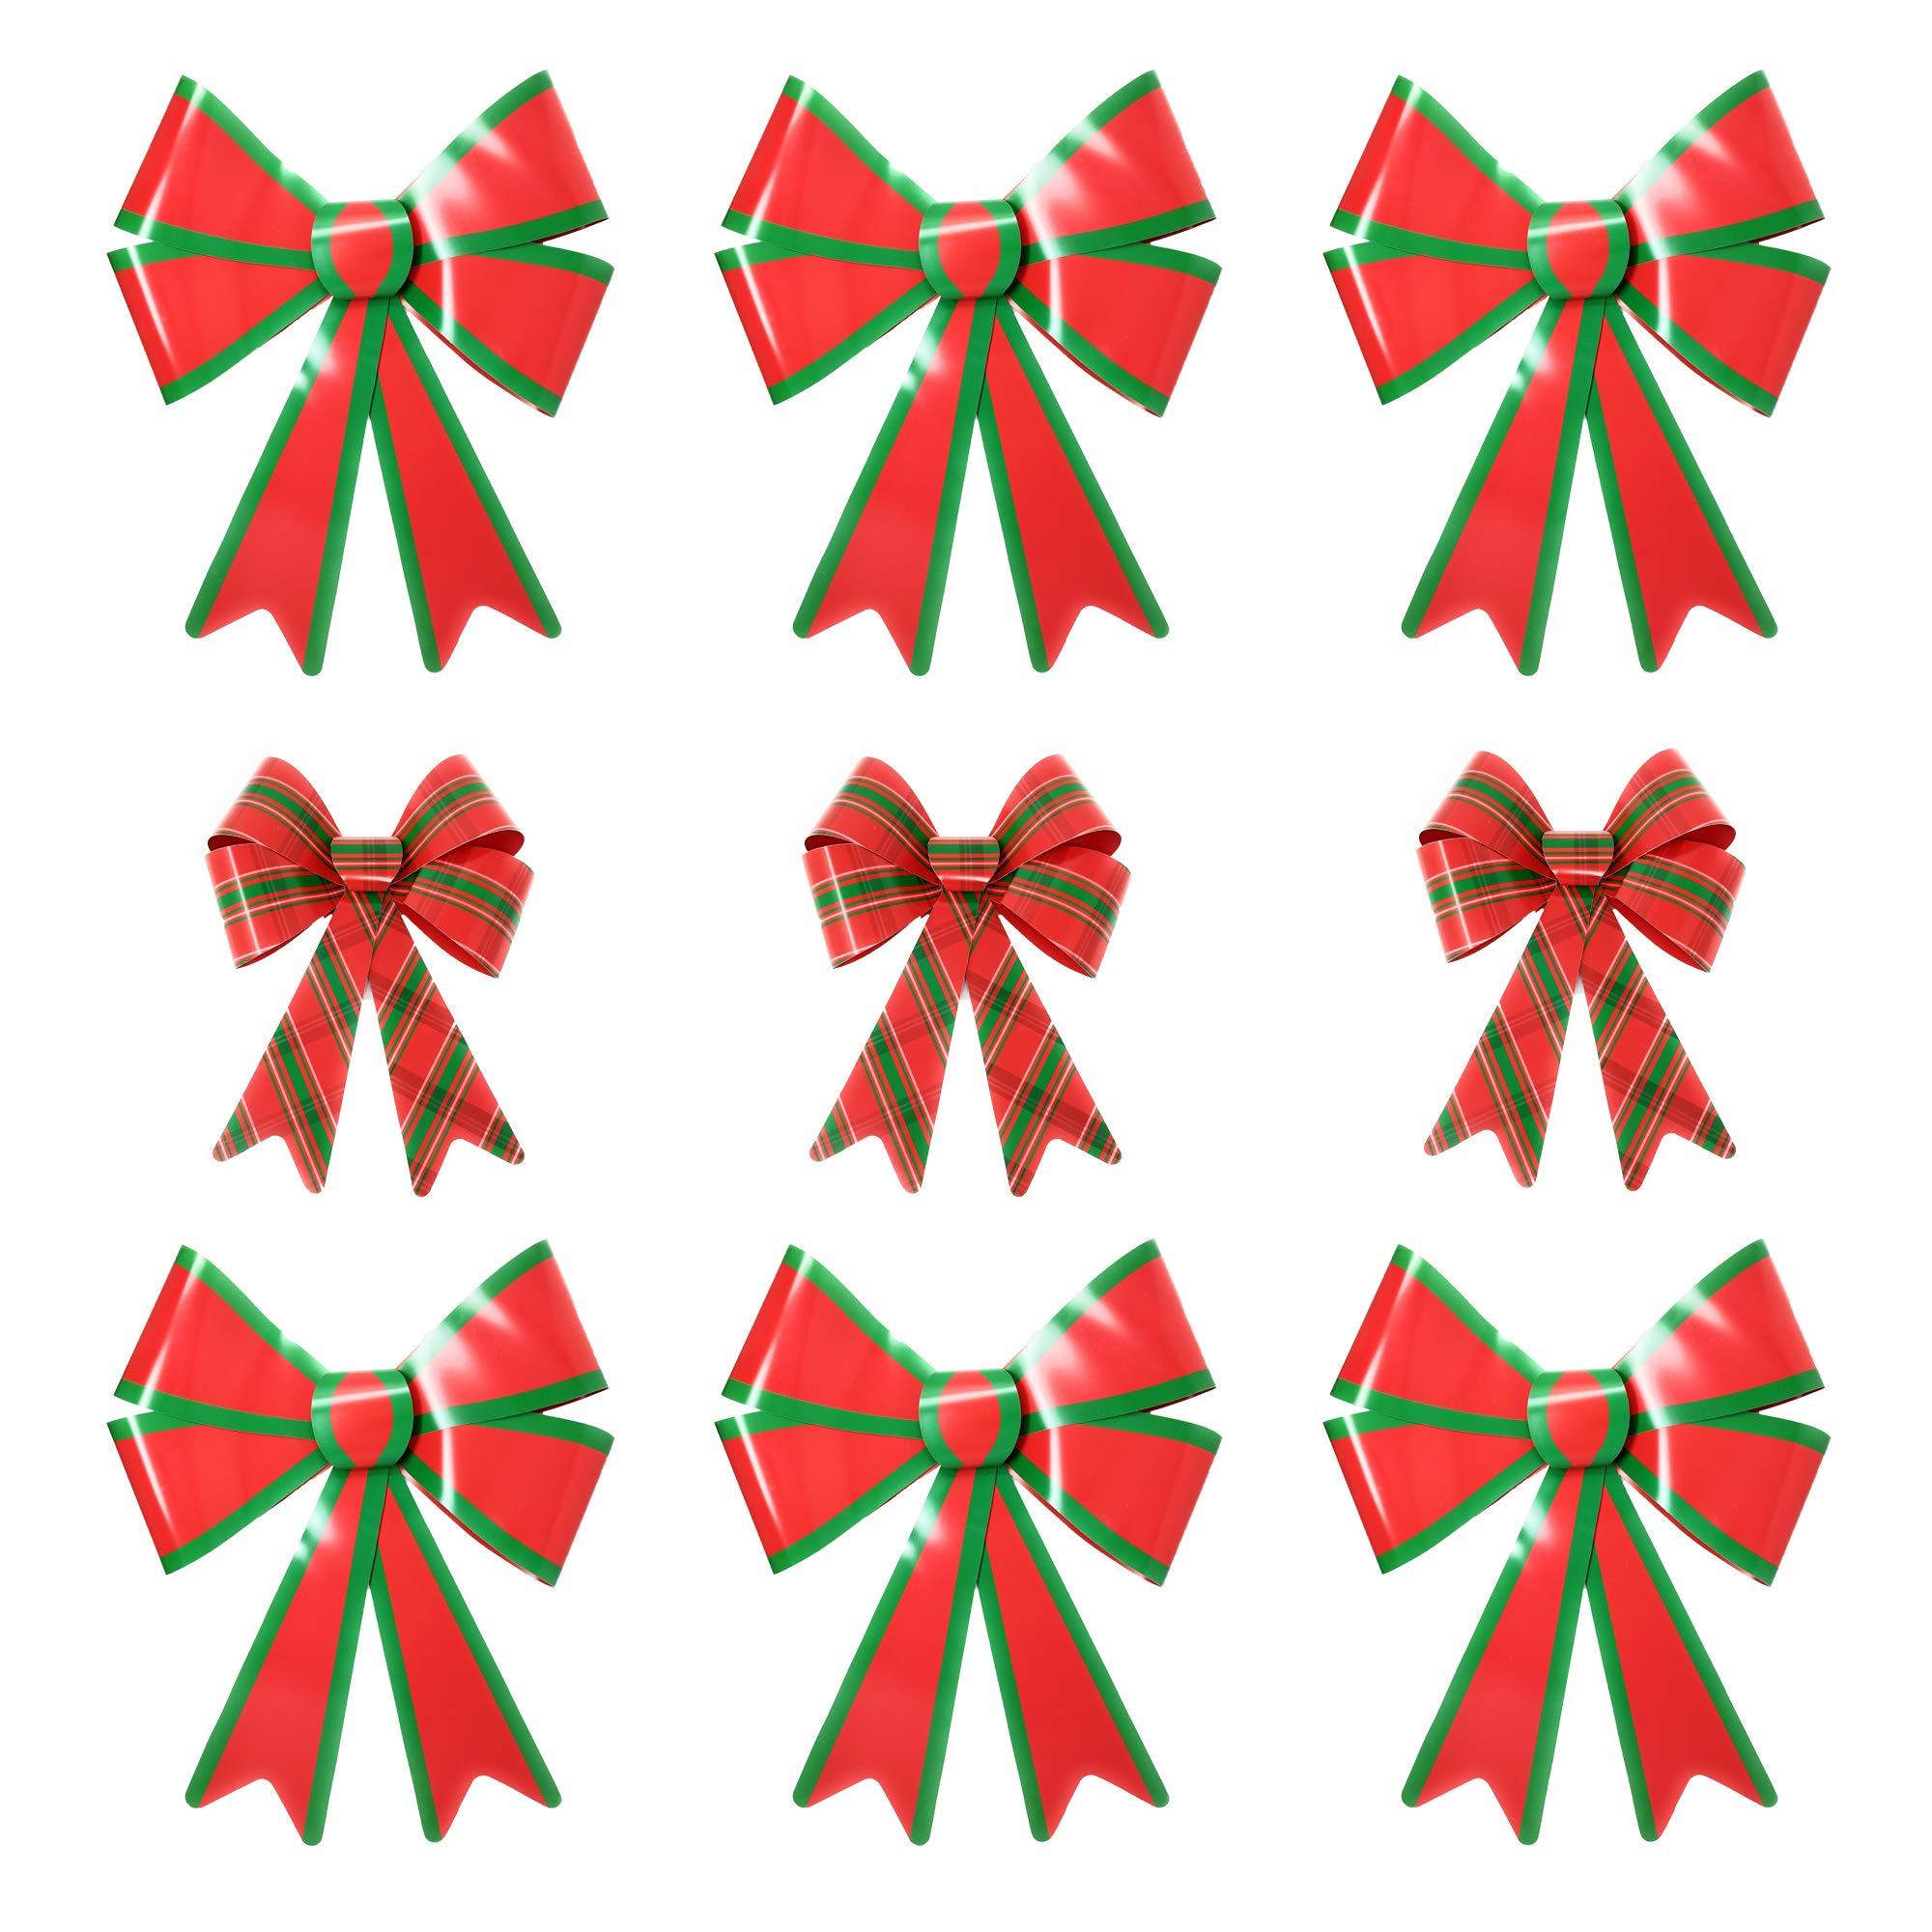 Red & Green Christmas Decorative Bow Bundle - Set of 3 Medium Plaid PVC Bows (11'' x 14'') and 6 Large PVC Bows (19'' x 24'')